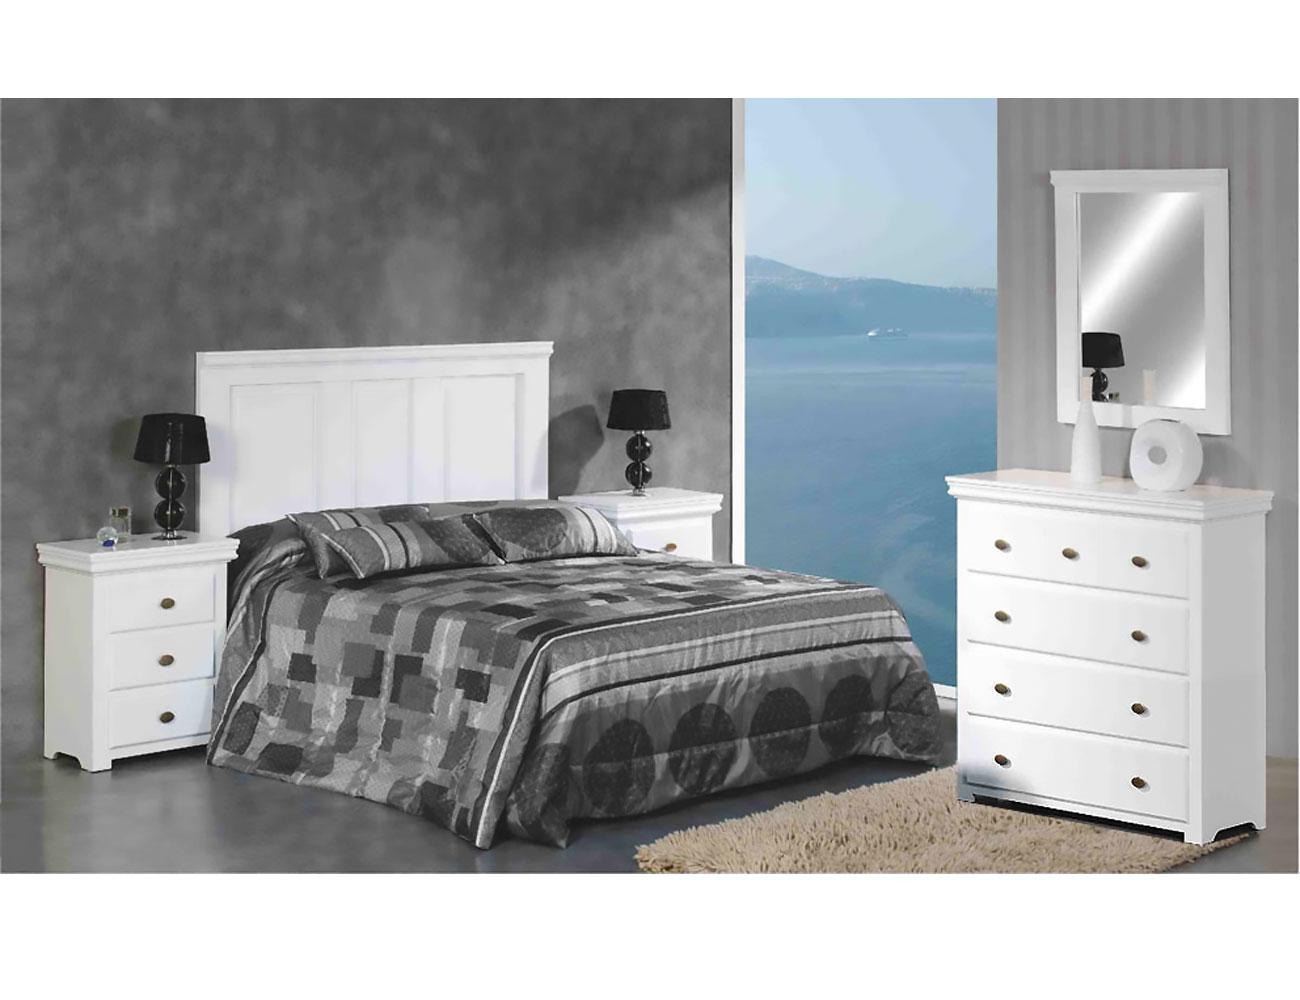 Dormitorio matrimonio comoda 5 c madera dm lacado blanco16